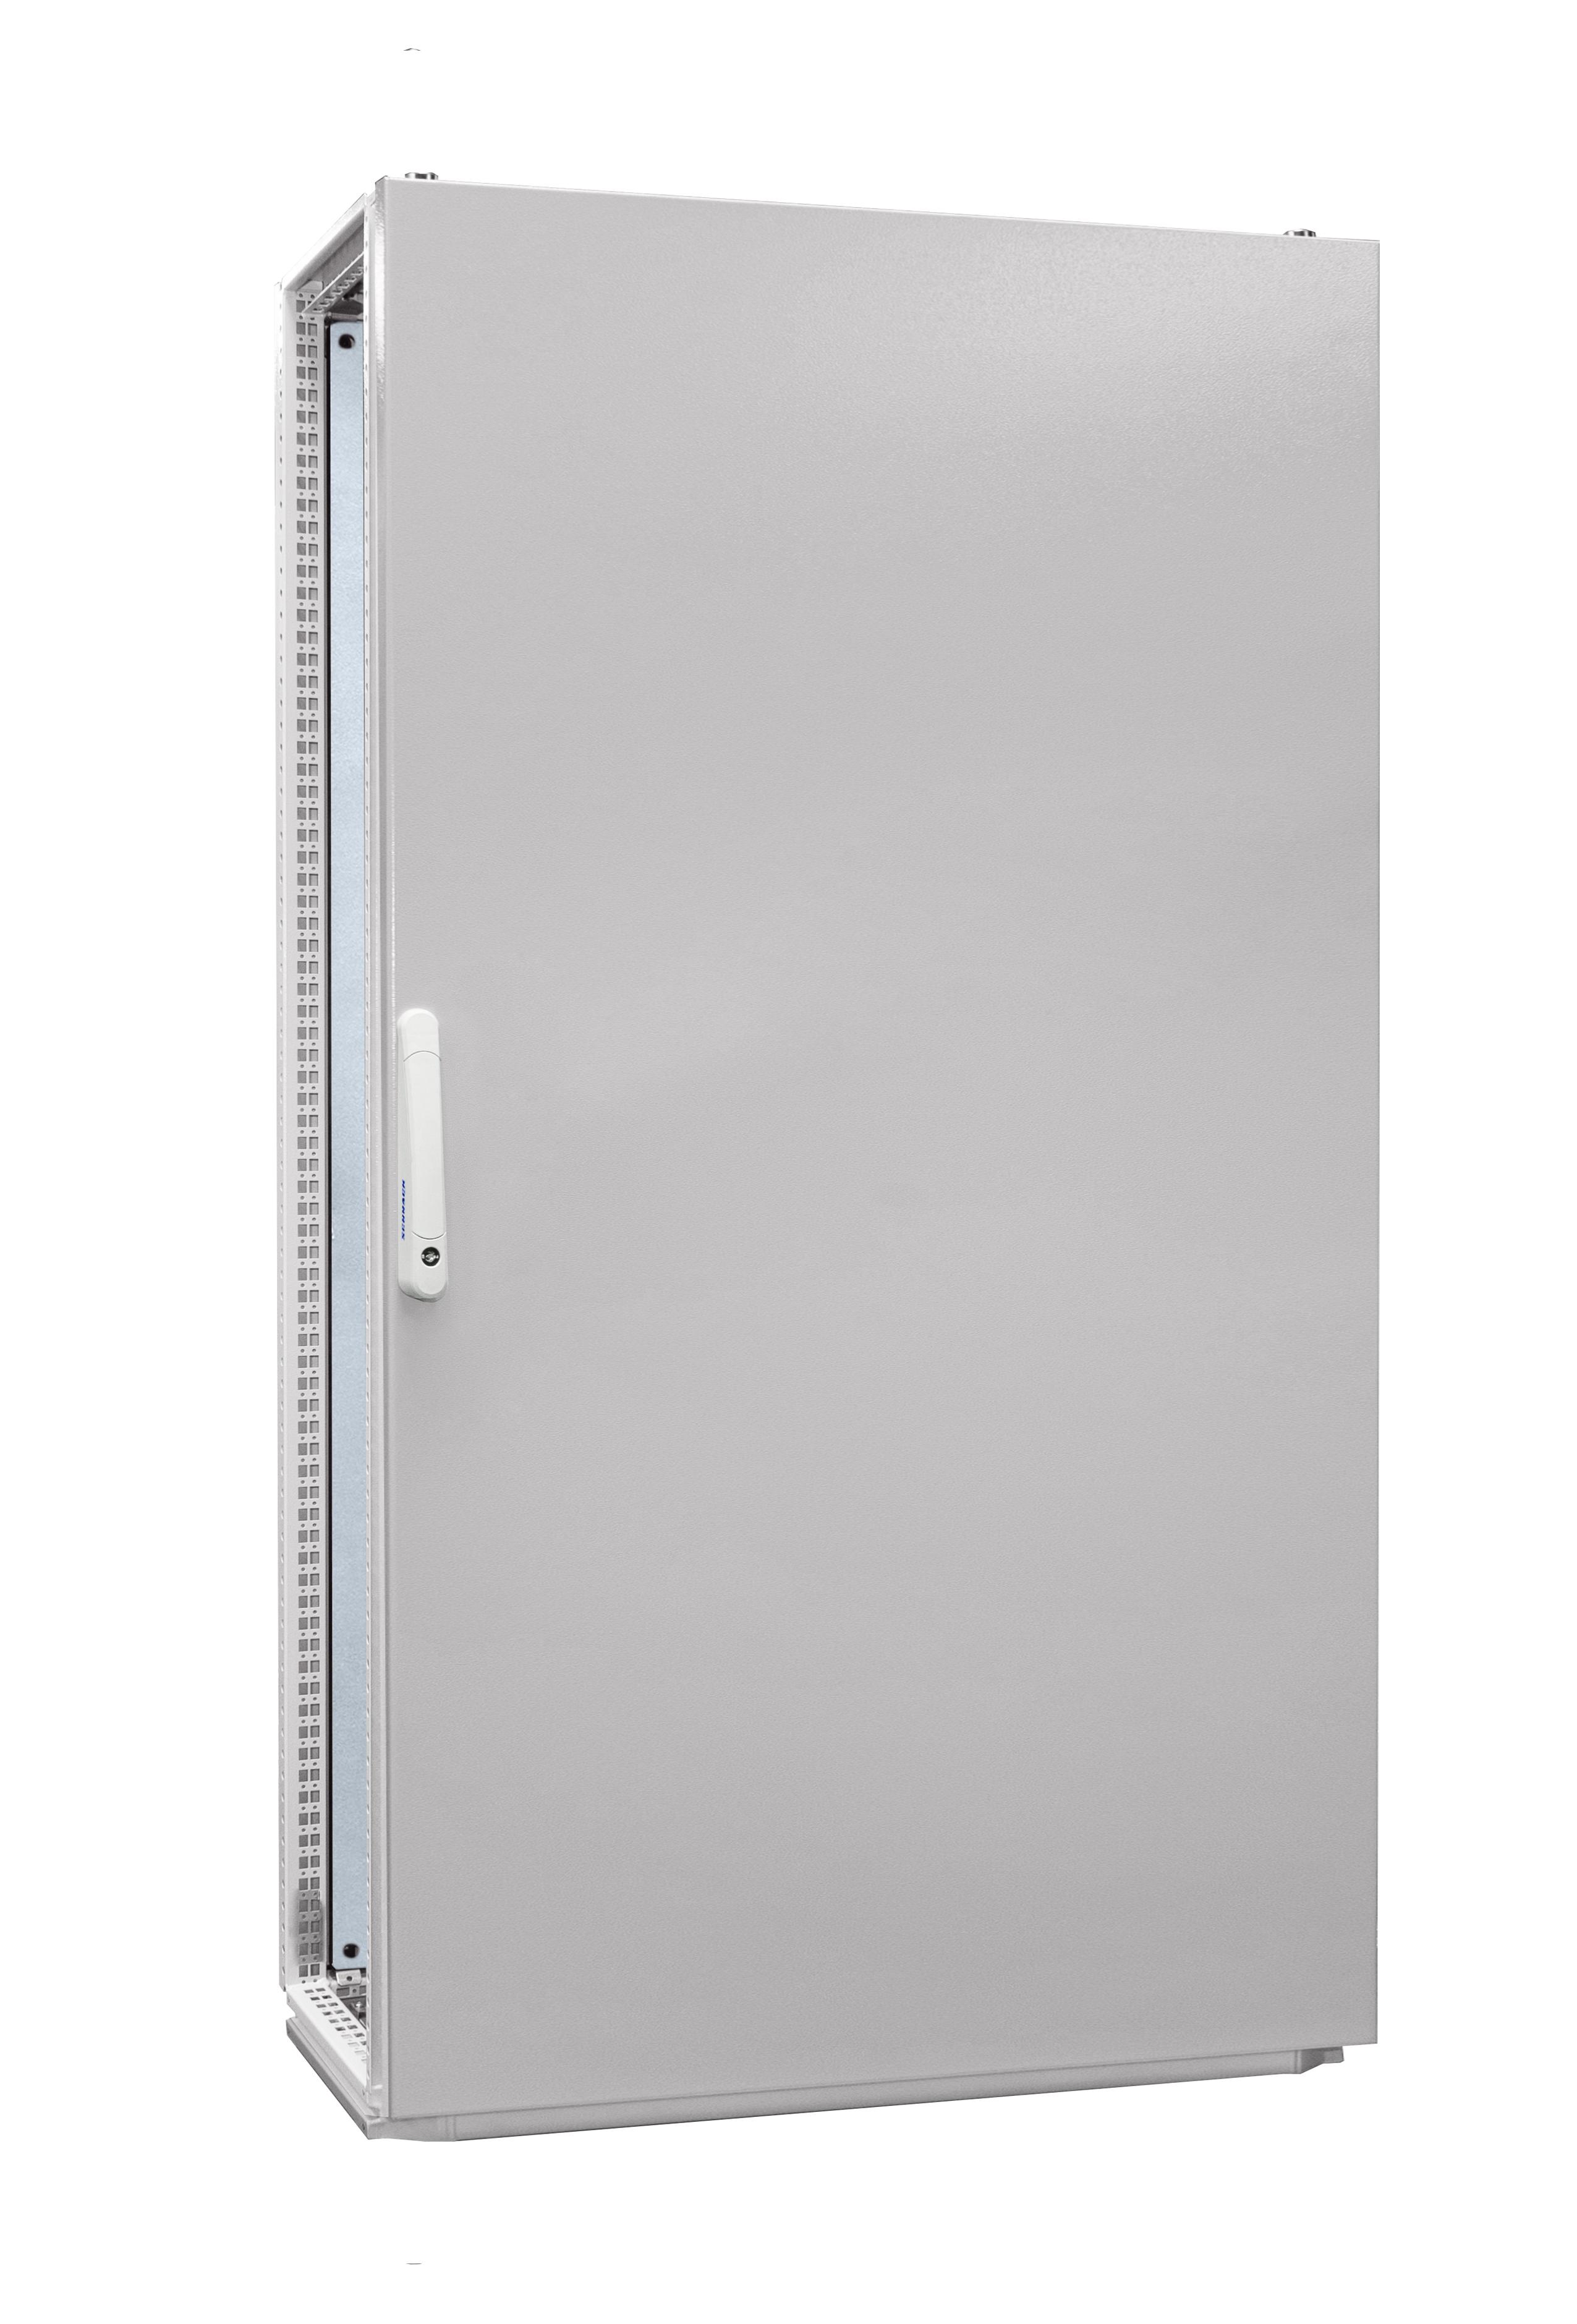 1 Stk Anreihschrank 1-Tür IP55 H=1800 B=1000 T=400mm Stahlblech AC181040--